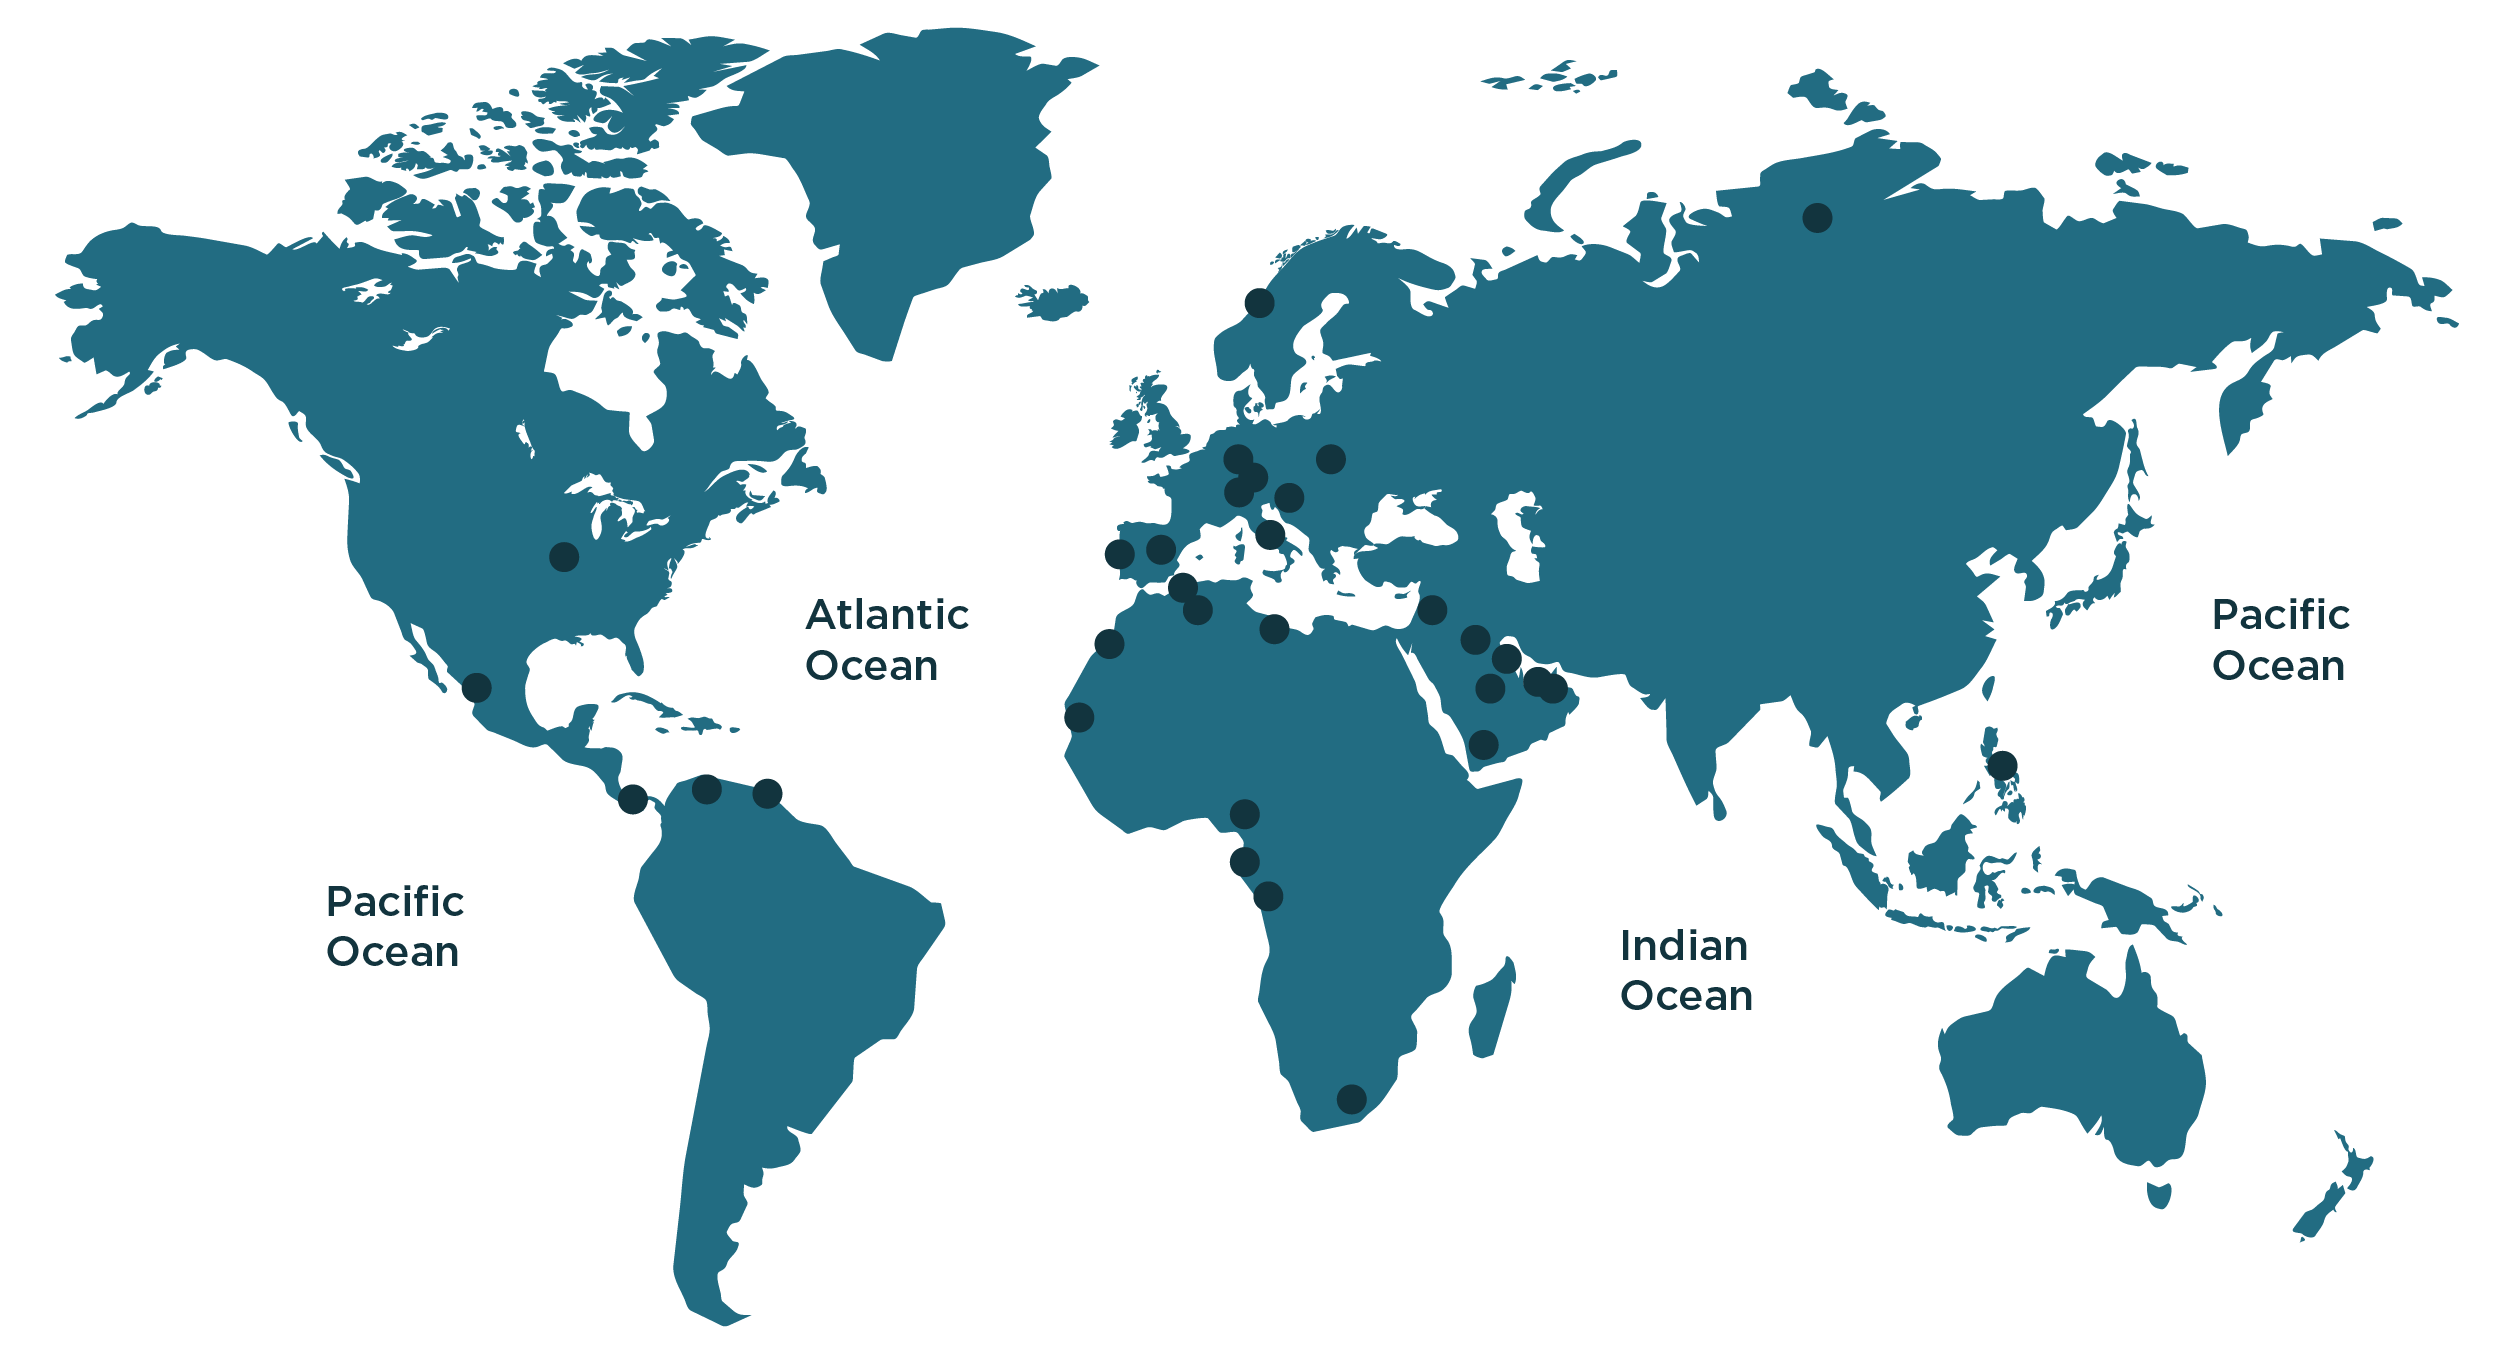 Mapa mundi clientes Acastimar página empresa